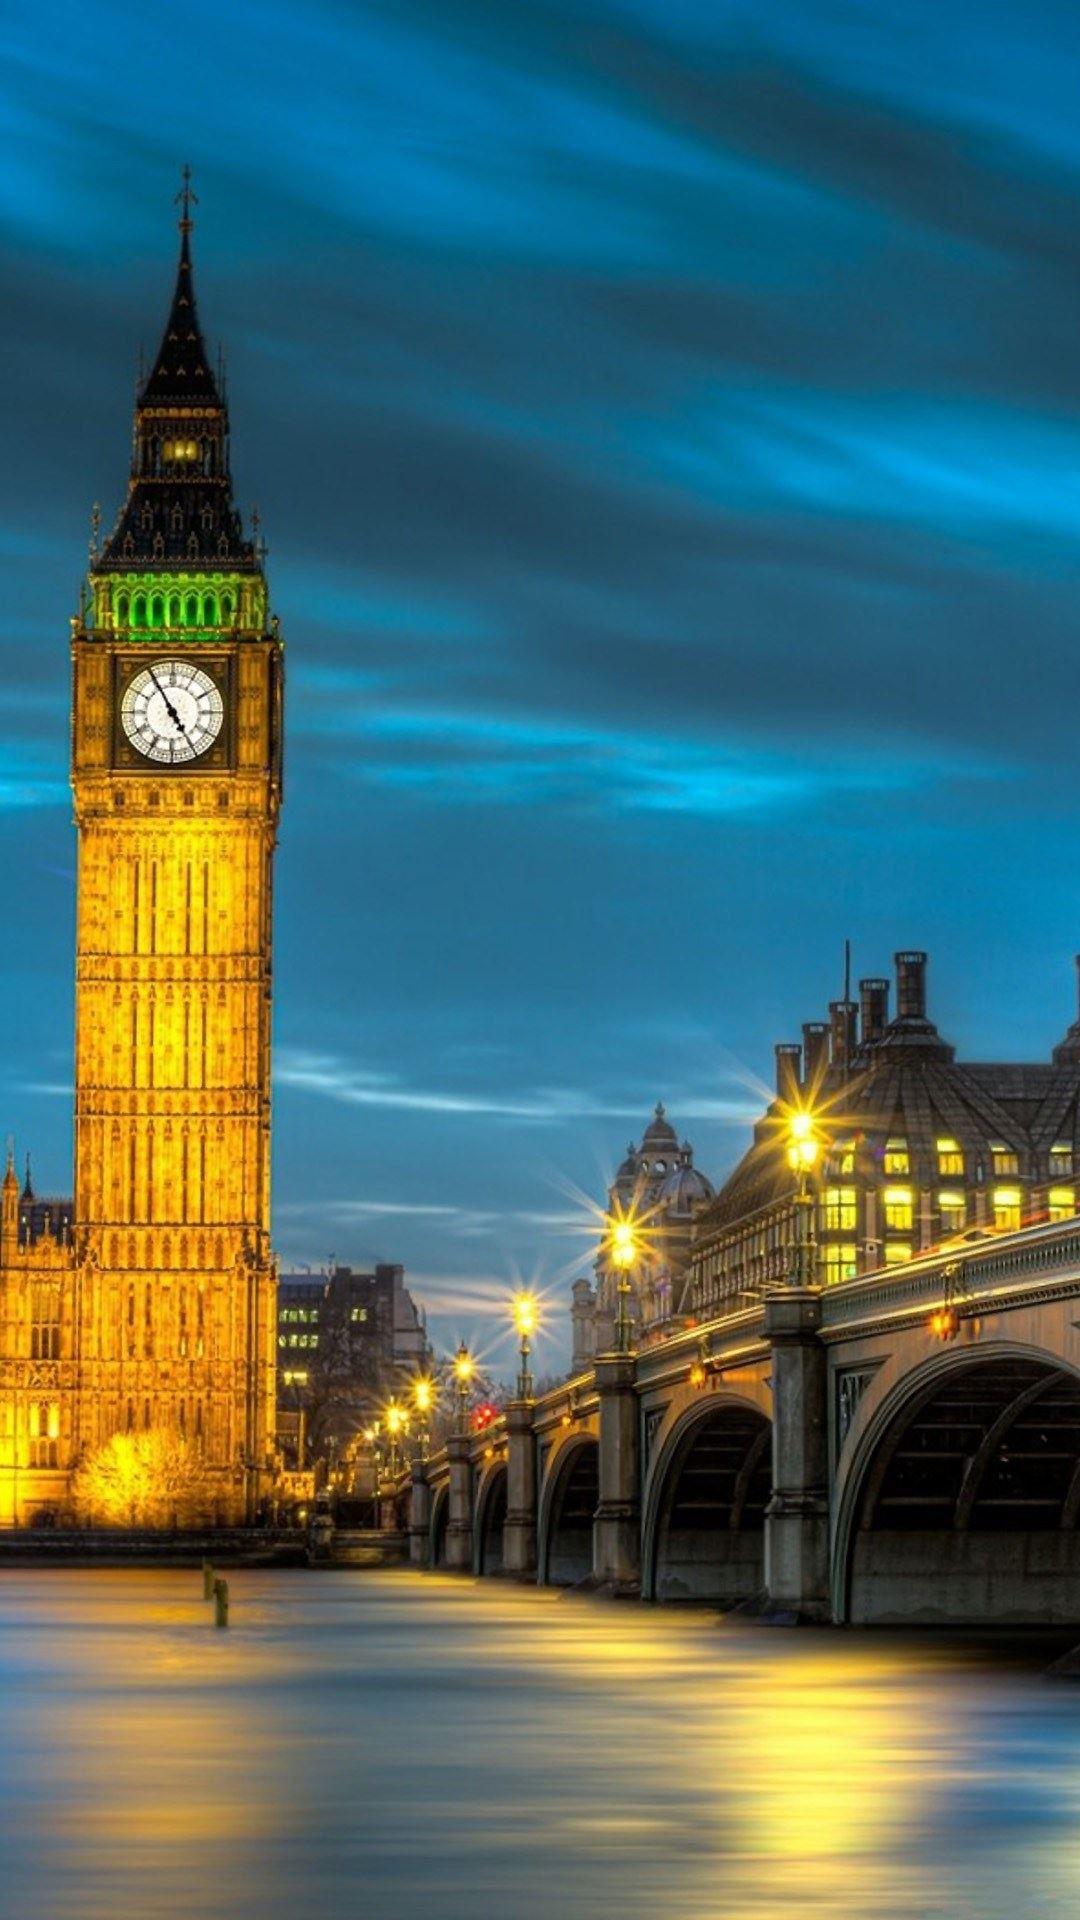 London Big Ben Illustration